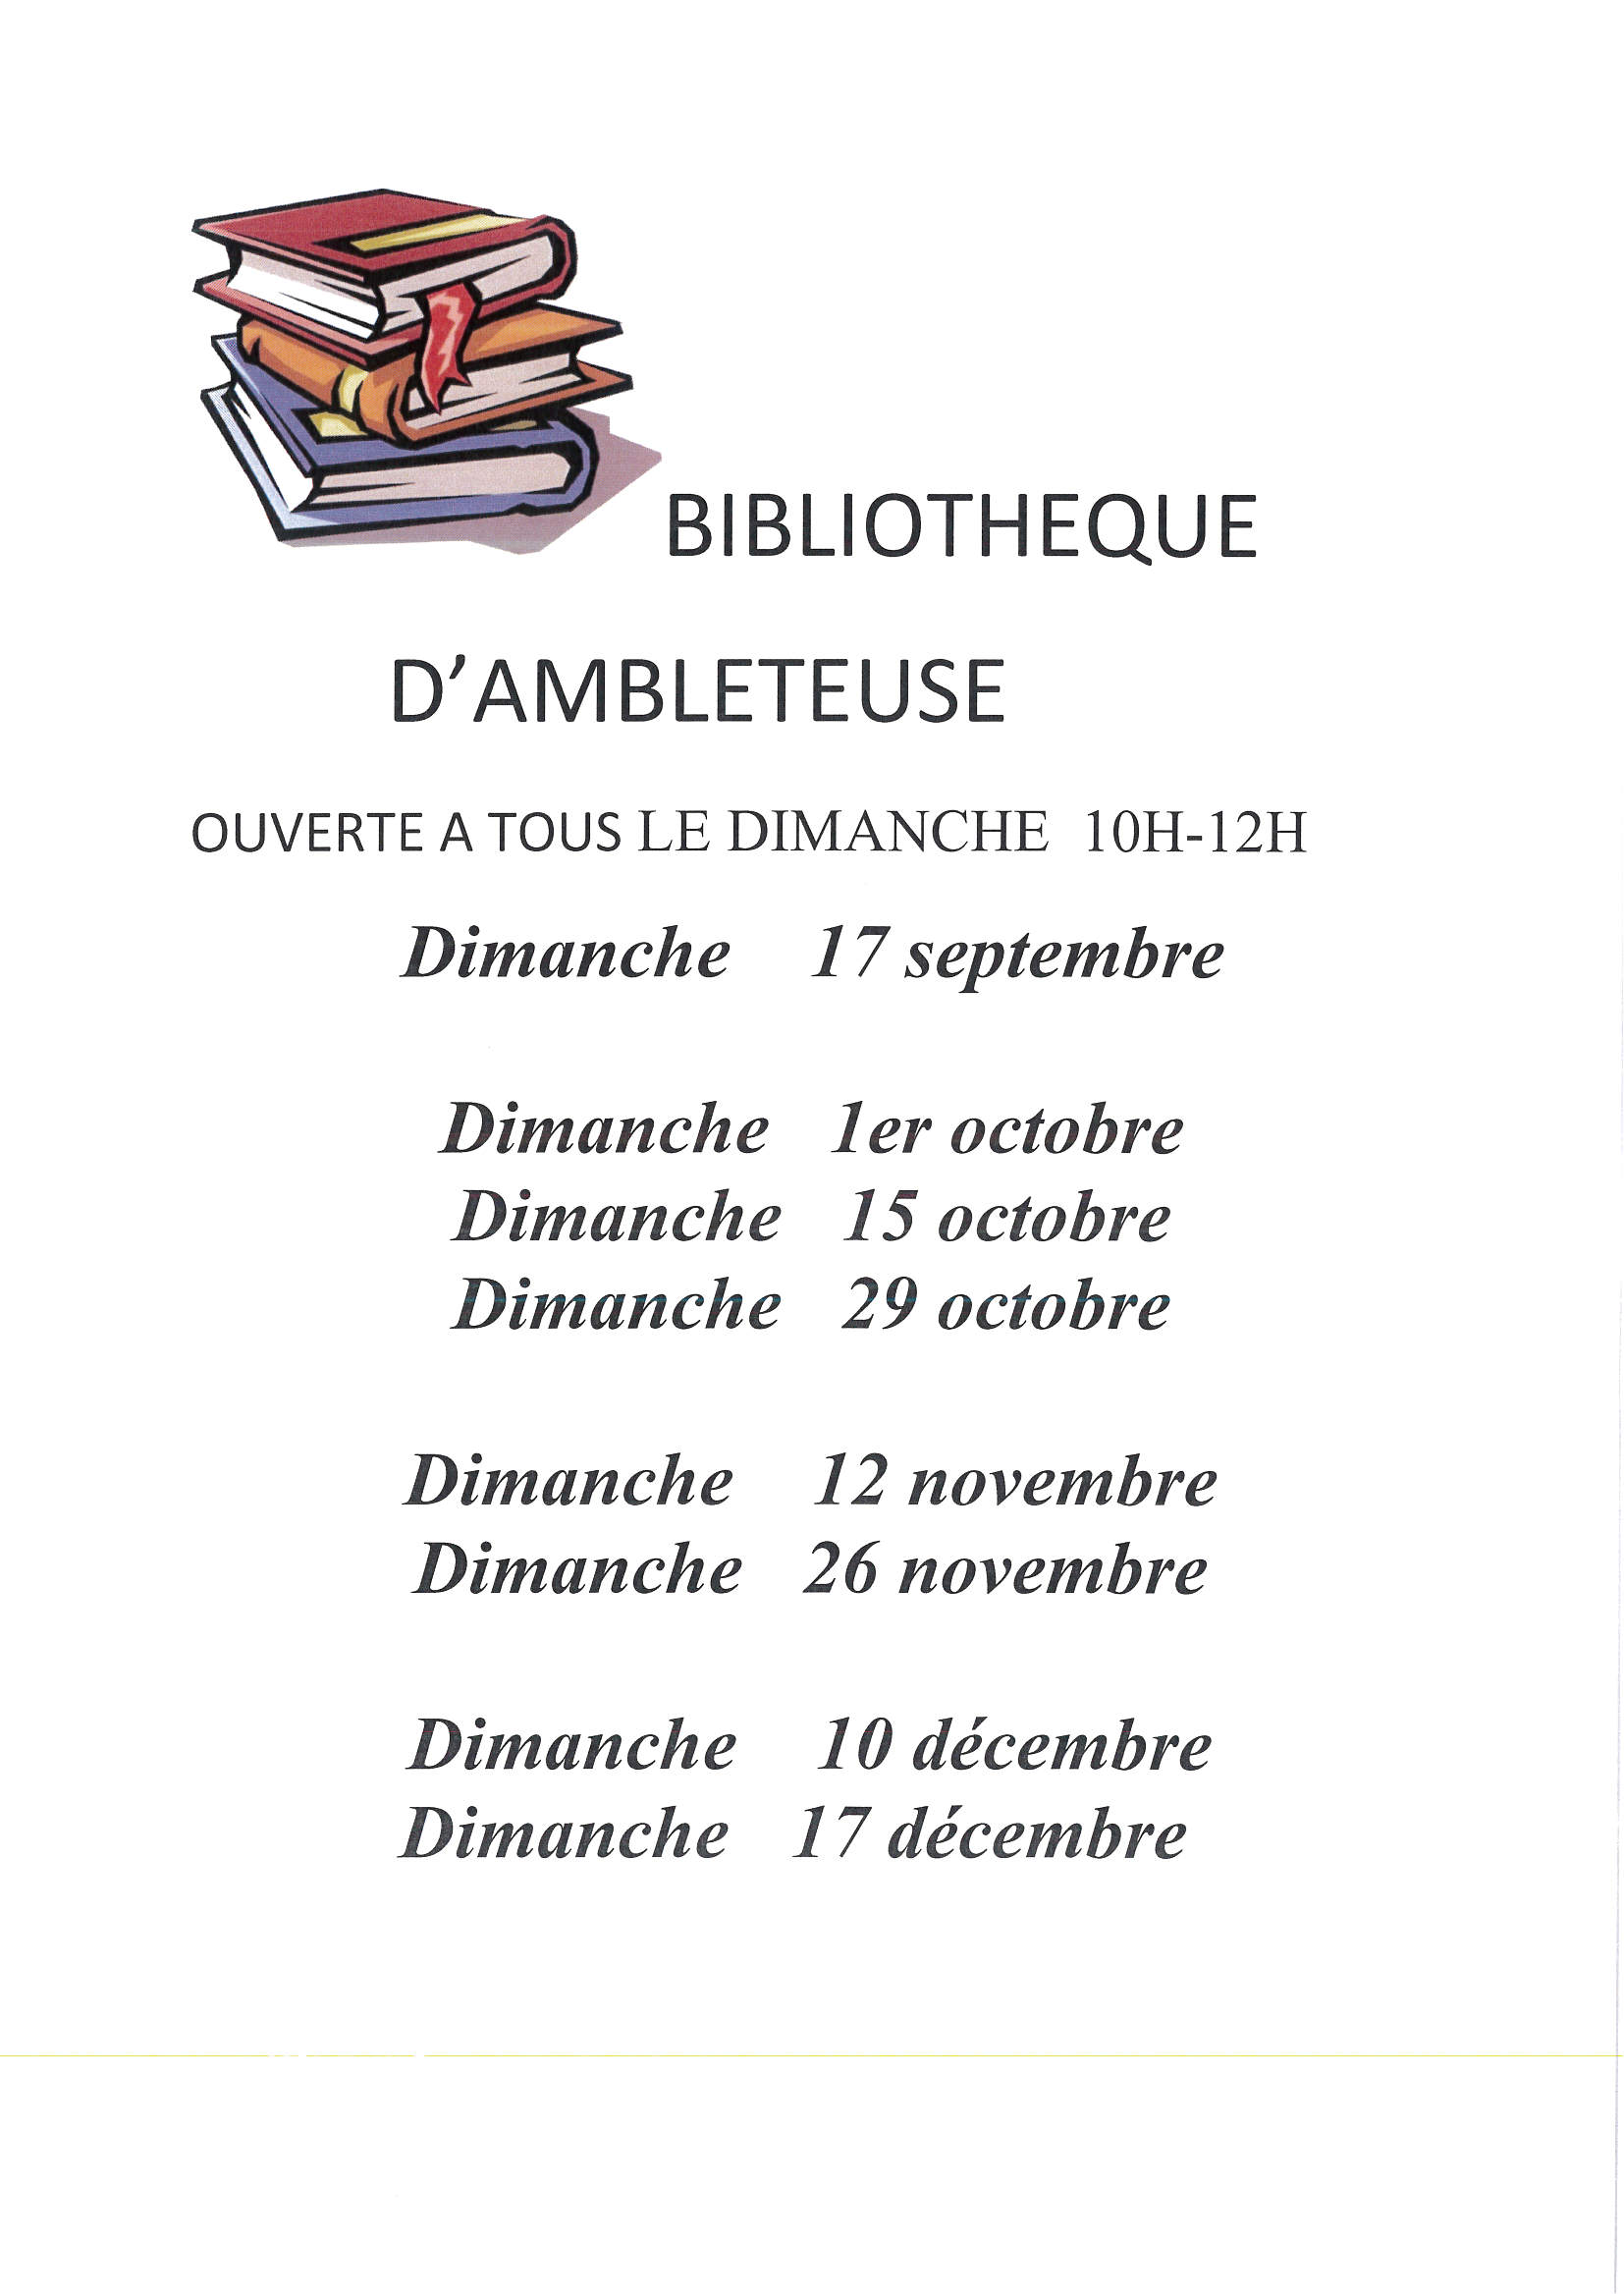 bibliotheque_001.jpg